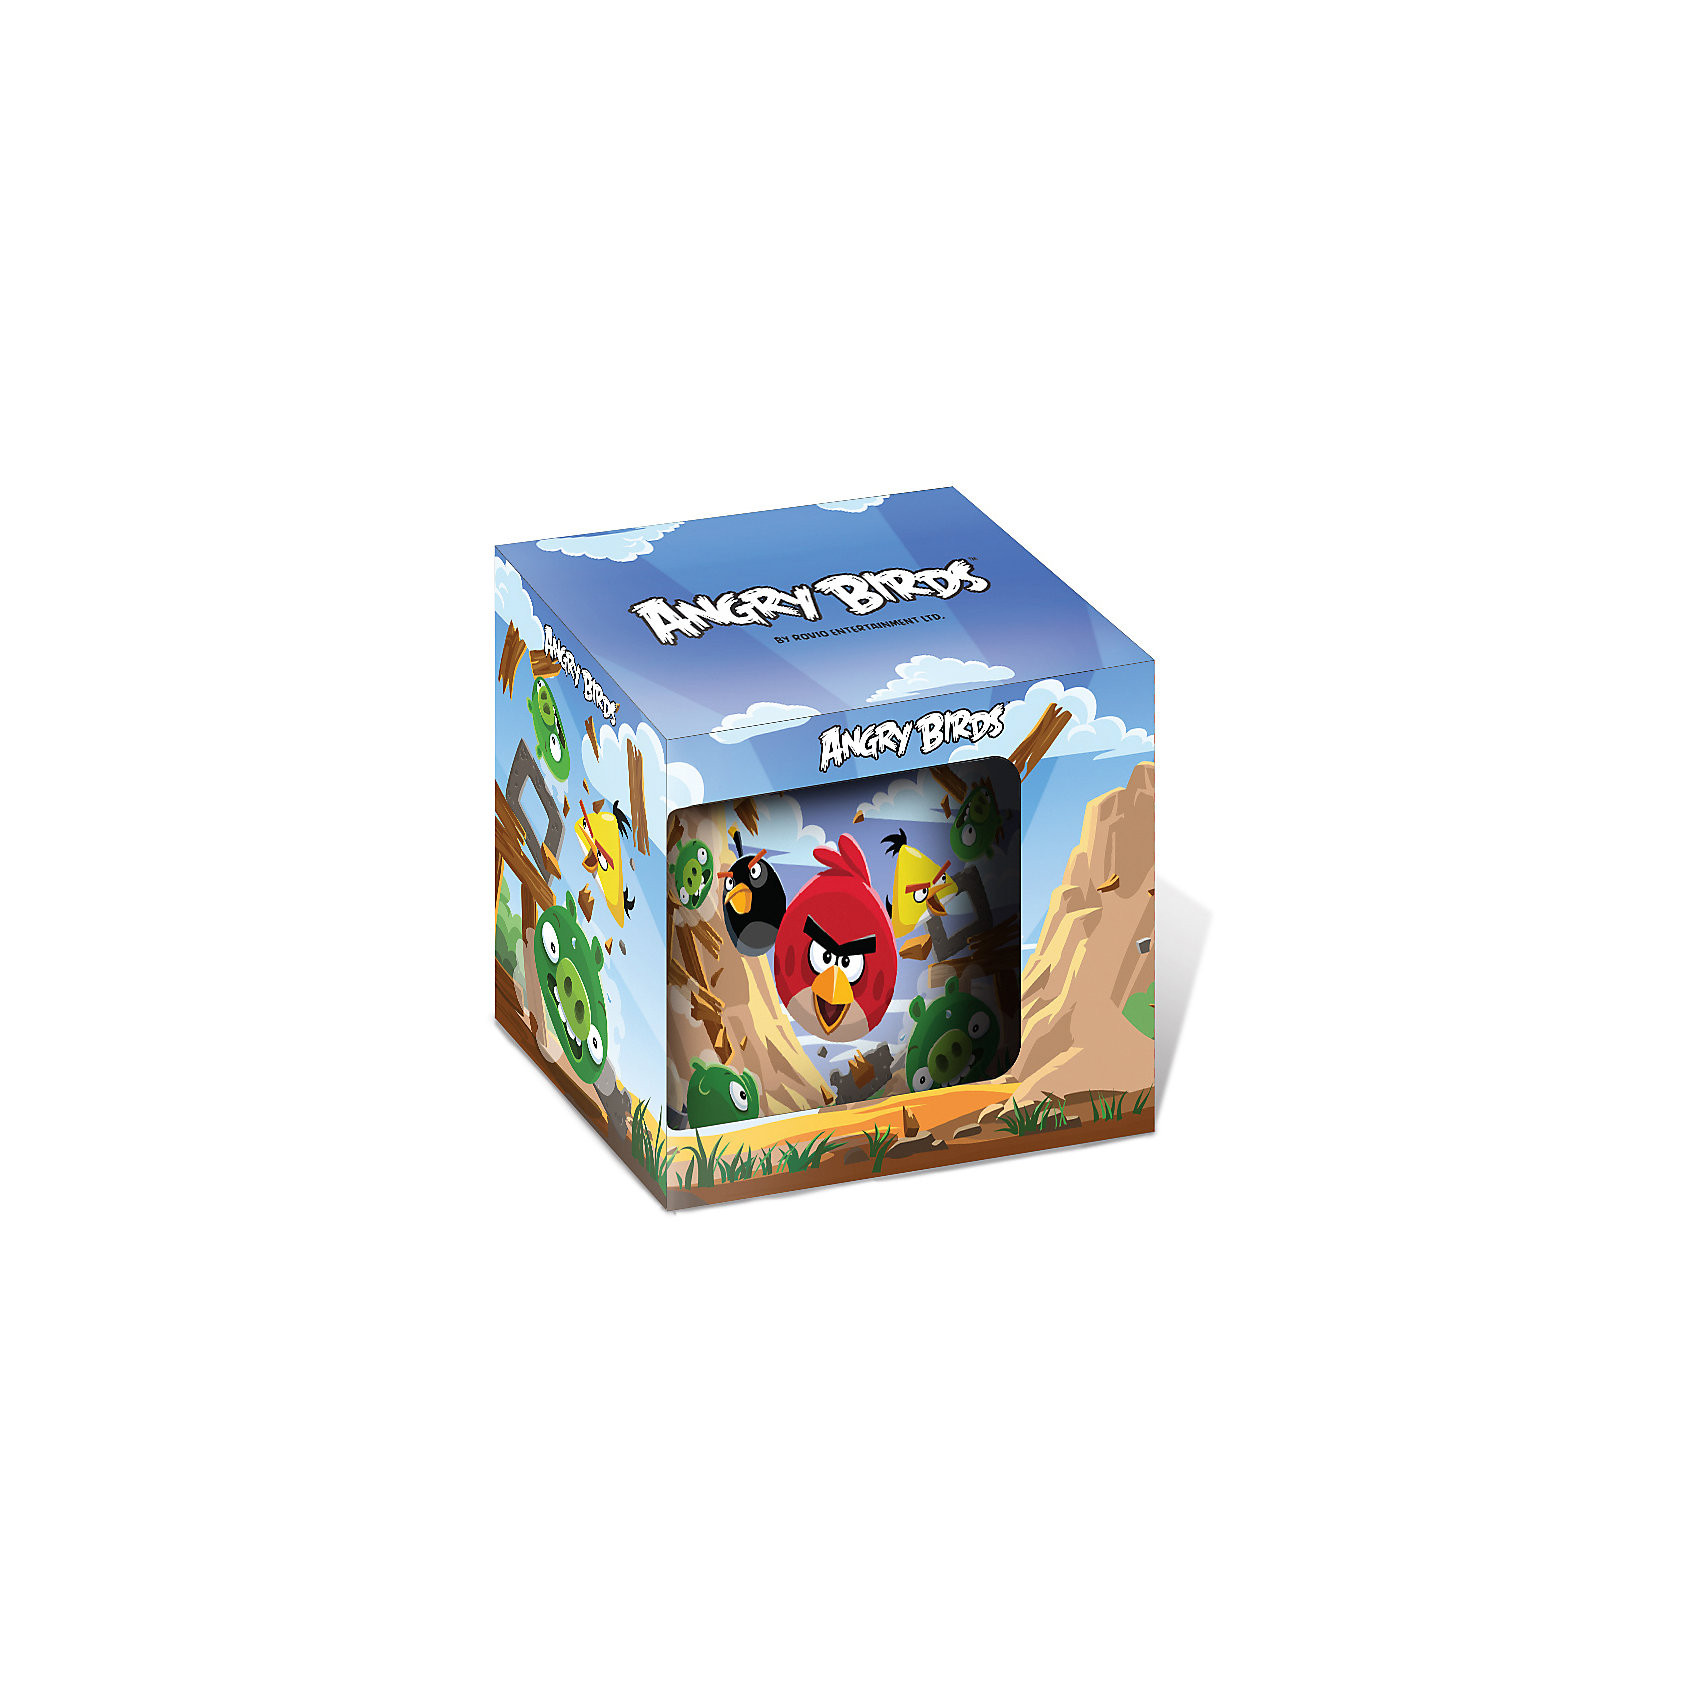 Кружка «Птицы» 300 мл (керамика), Angry Birds